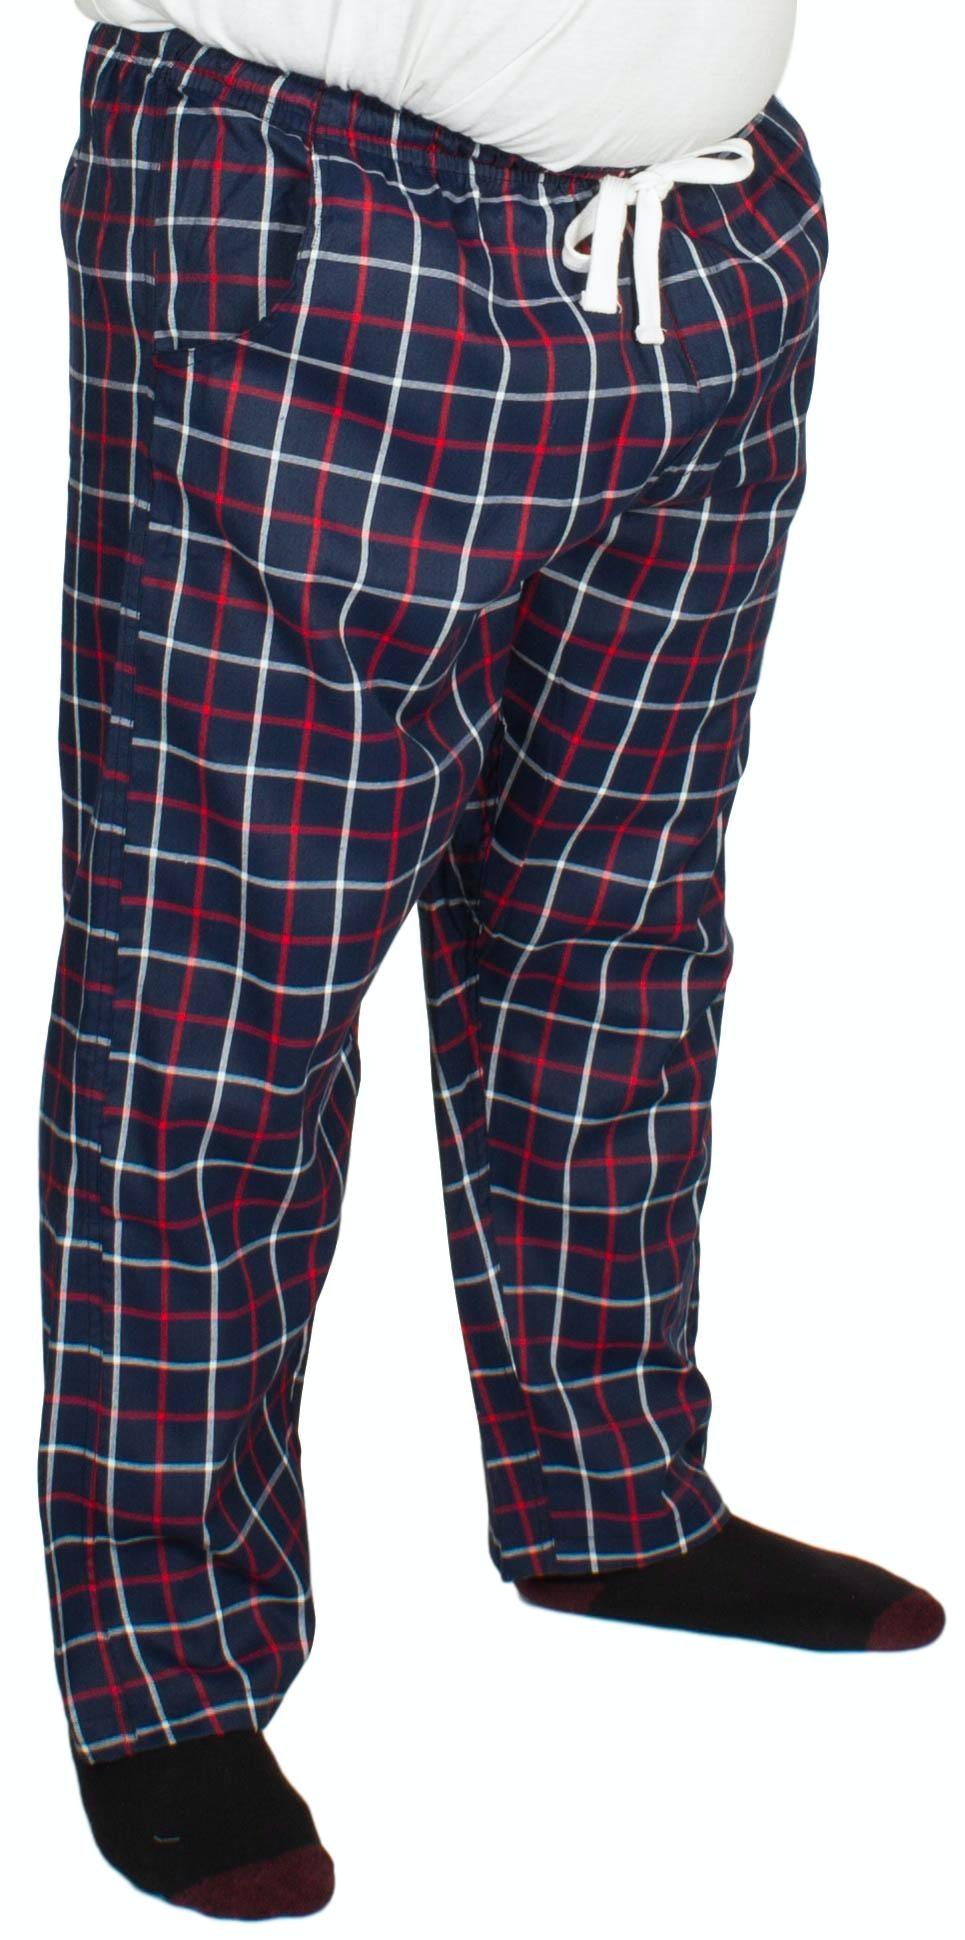 Bigdude Modern Check Lounge Pants Navy/Red